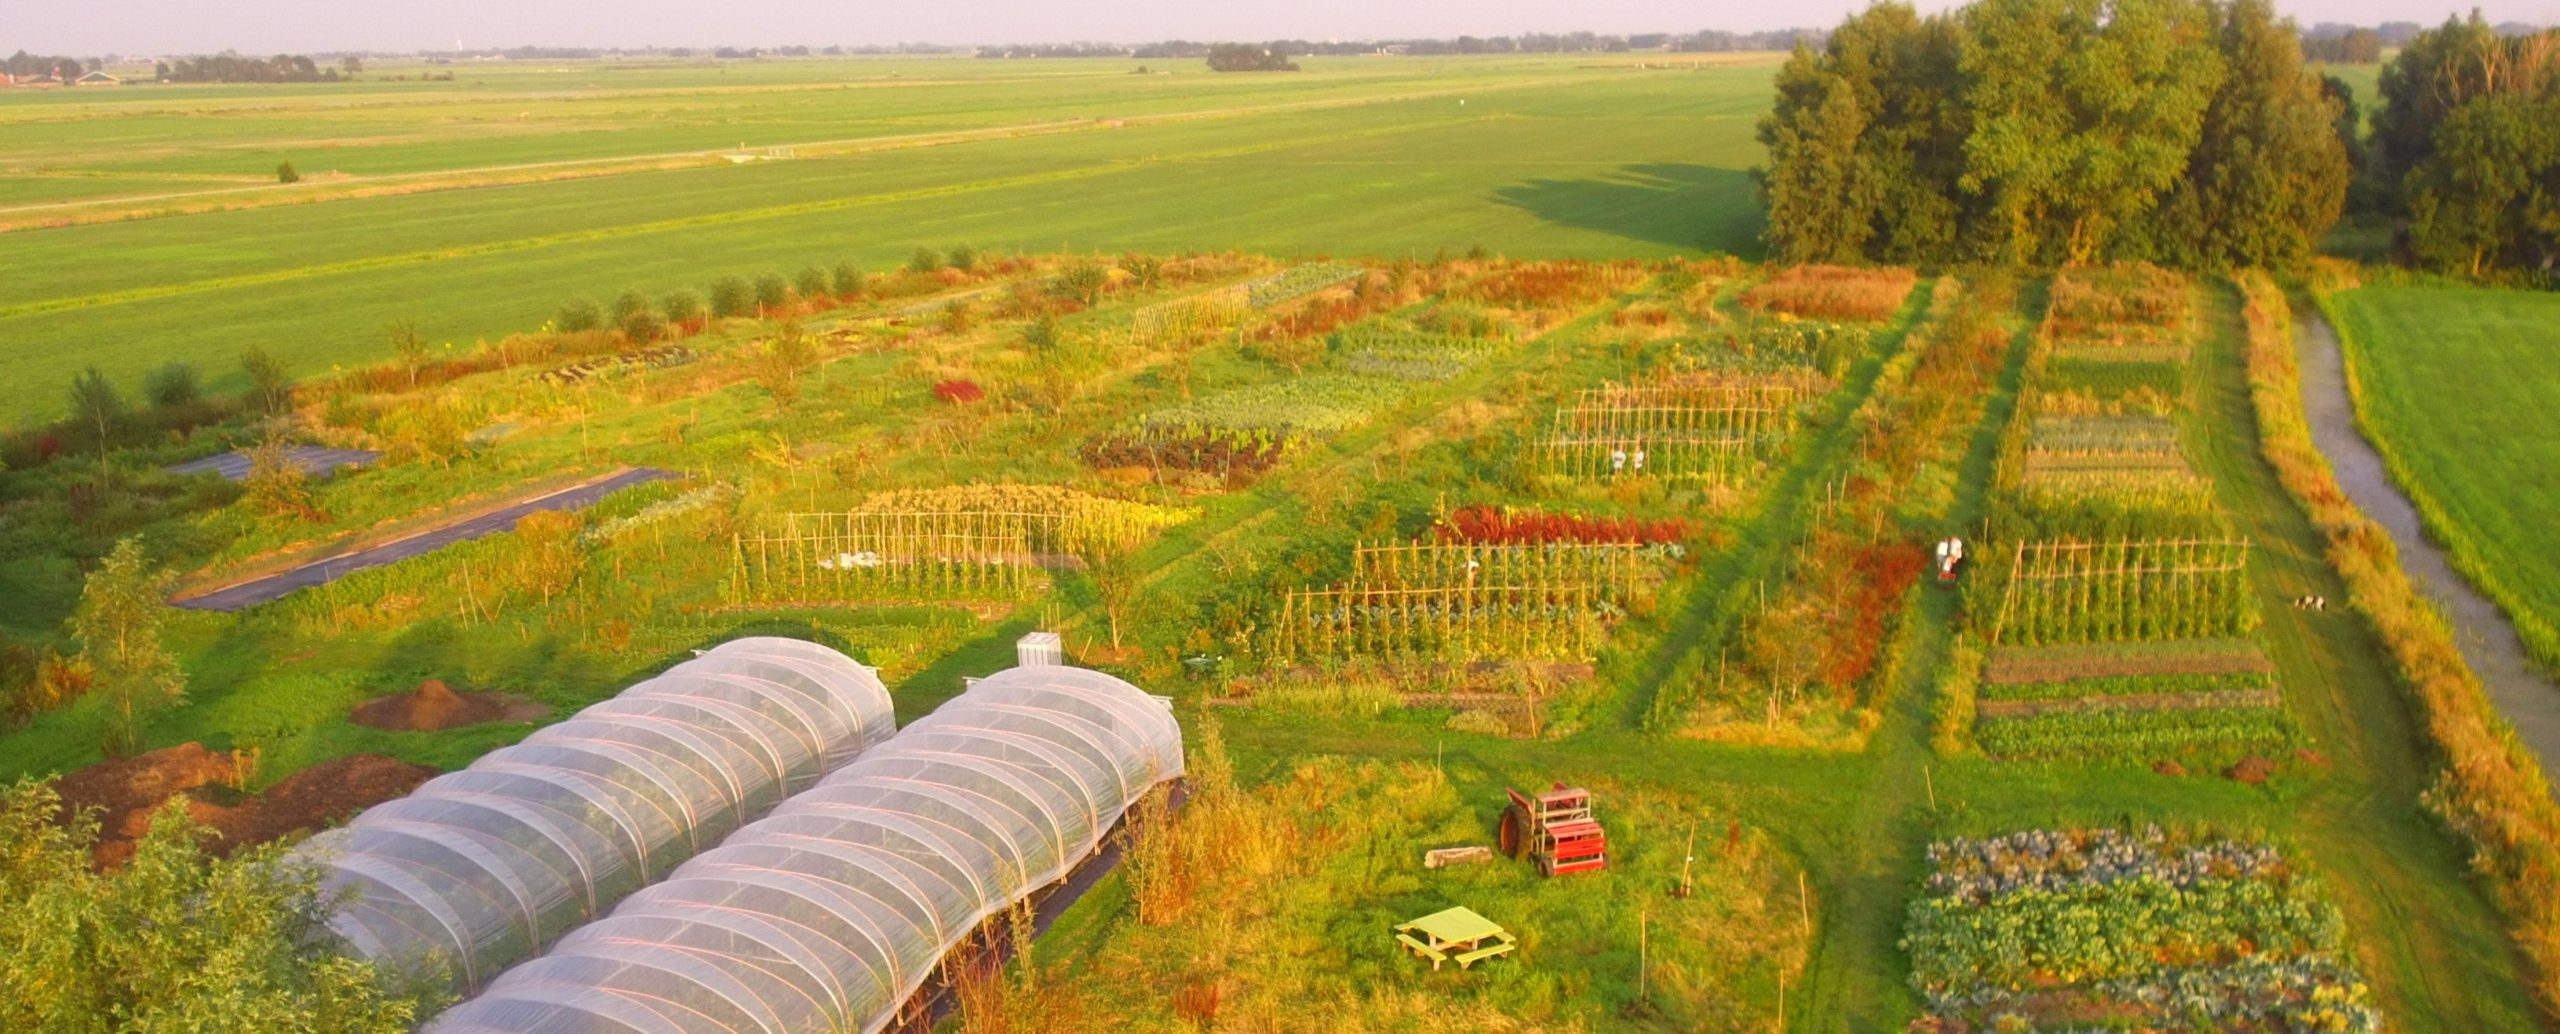 Verdiepingscursus Agro-ecologie voor Tuinders